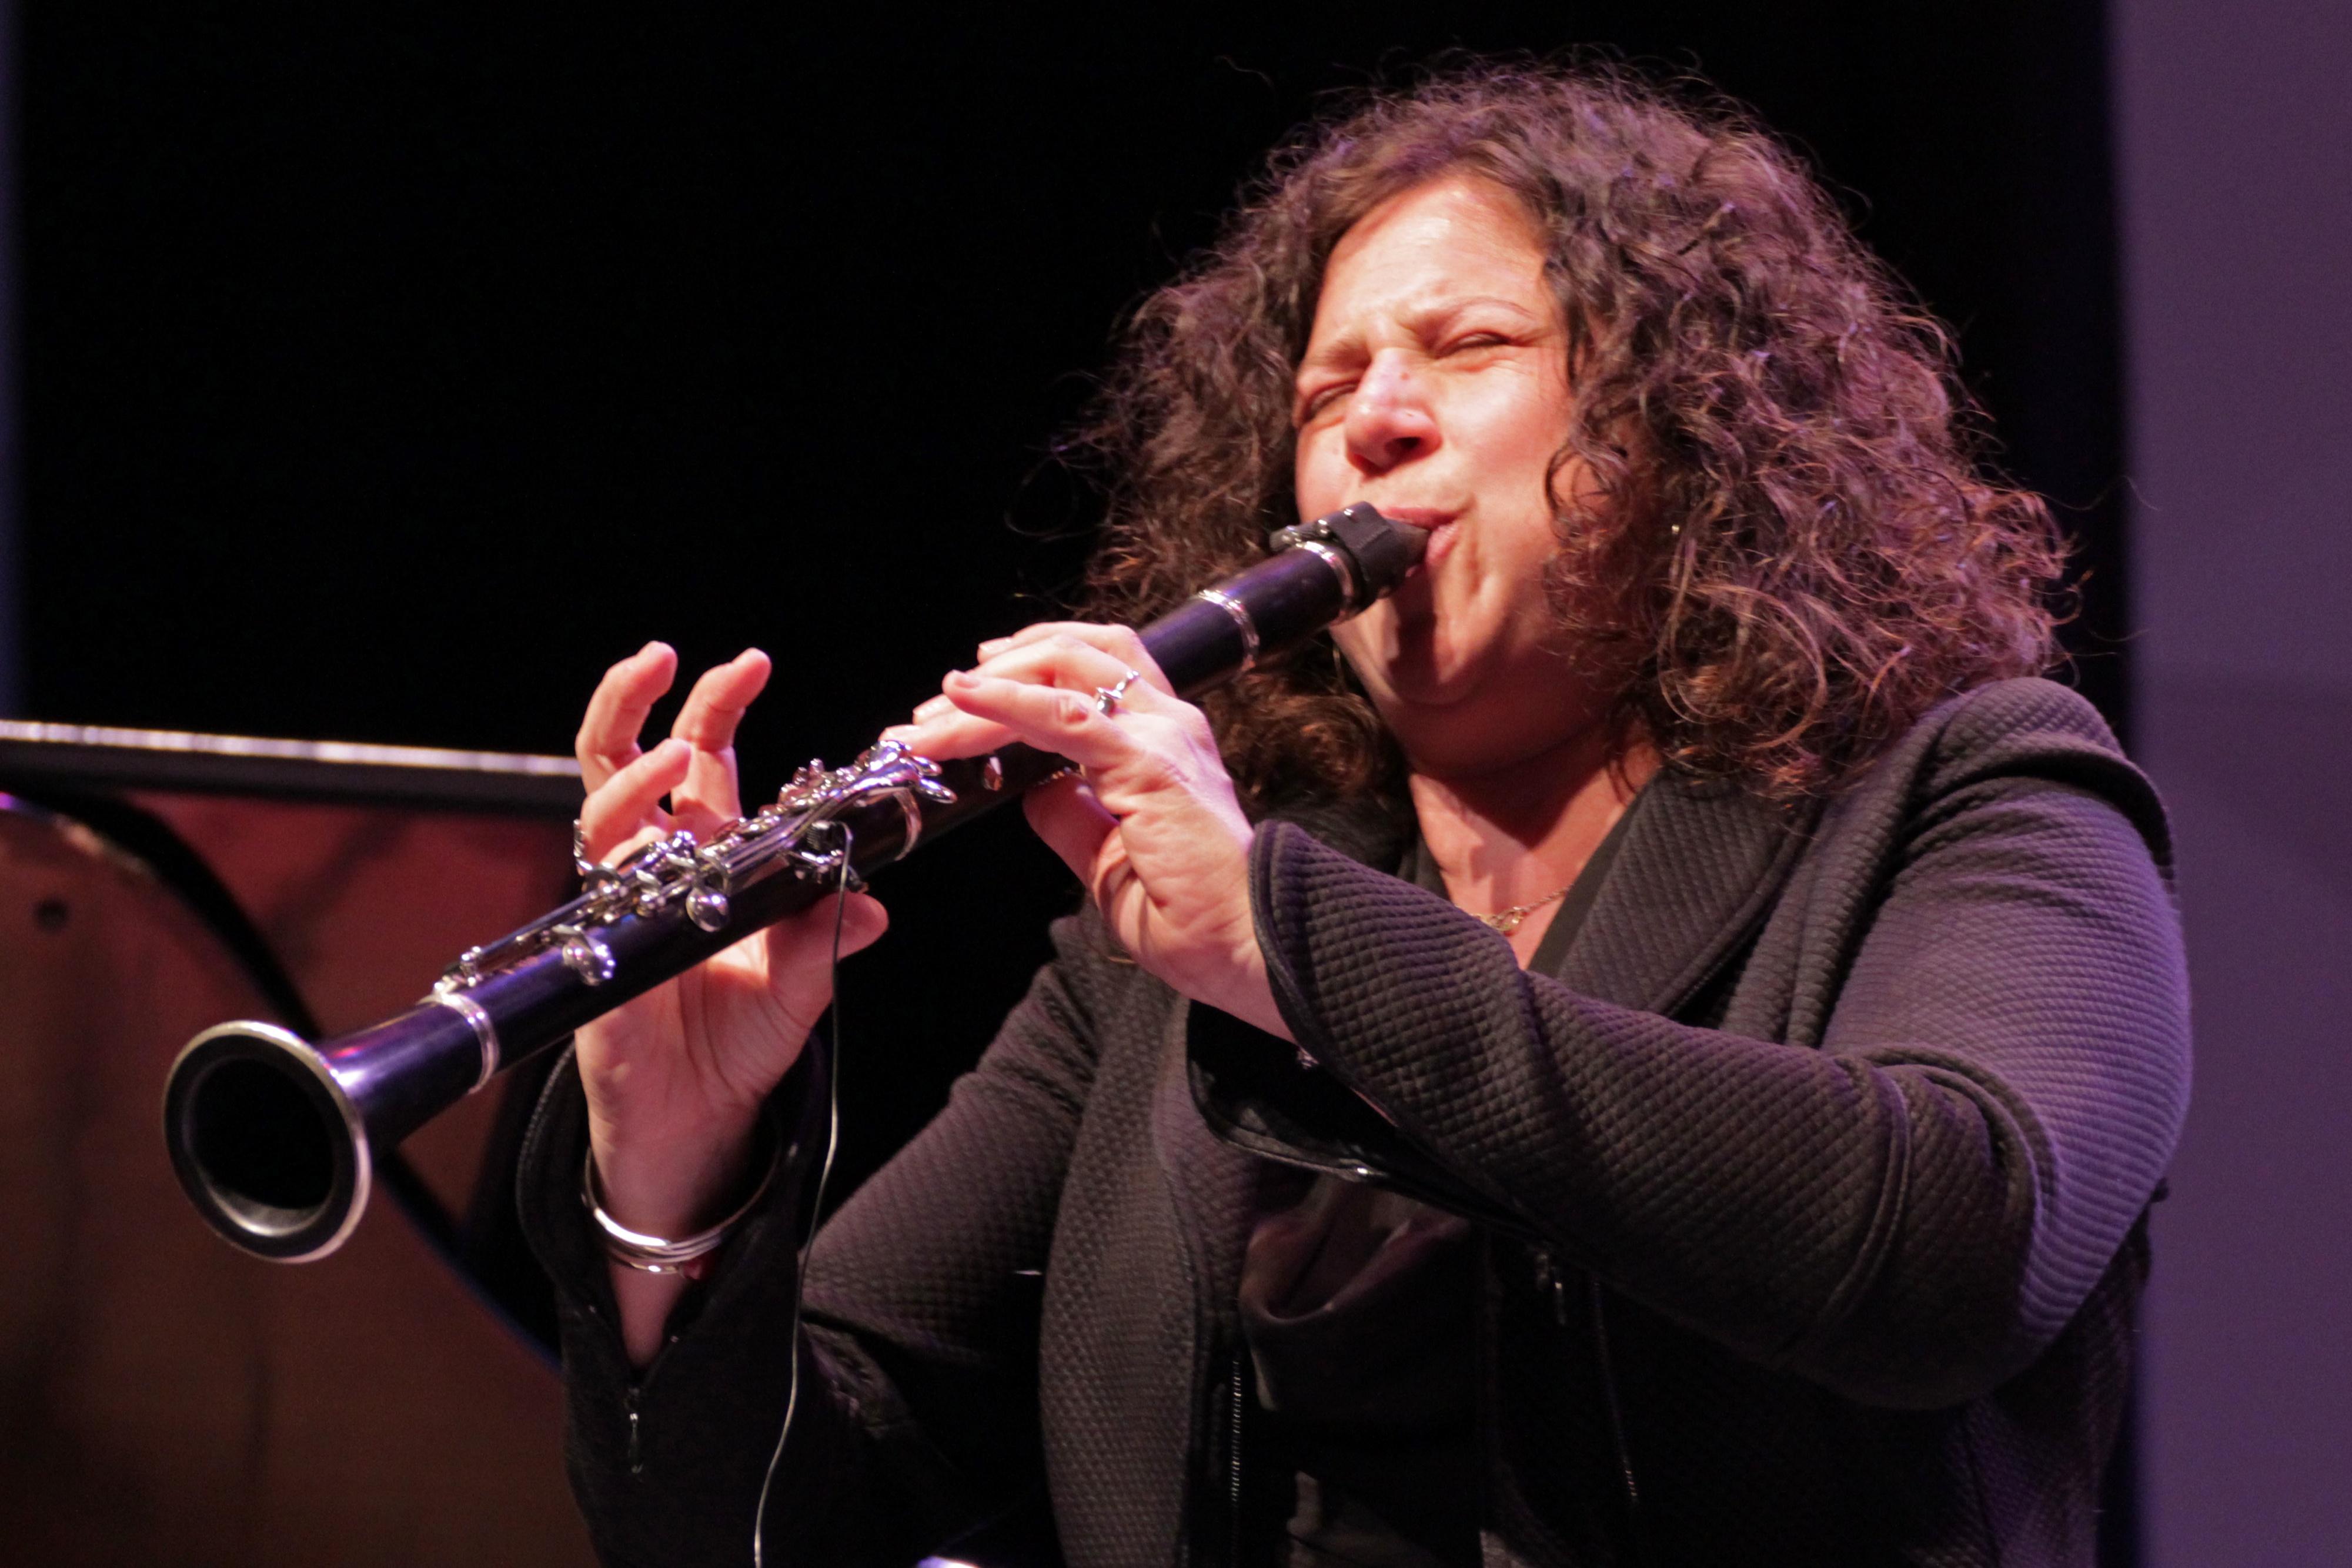 Anat cohen at tri-c jazzfest cleveland 2013